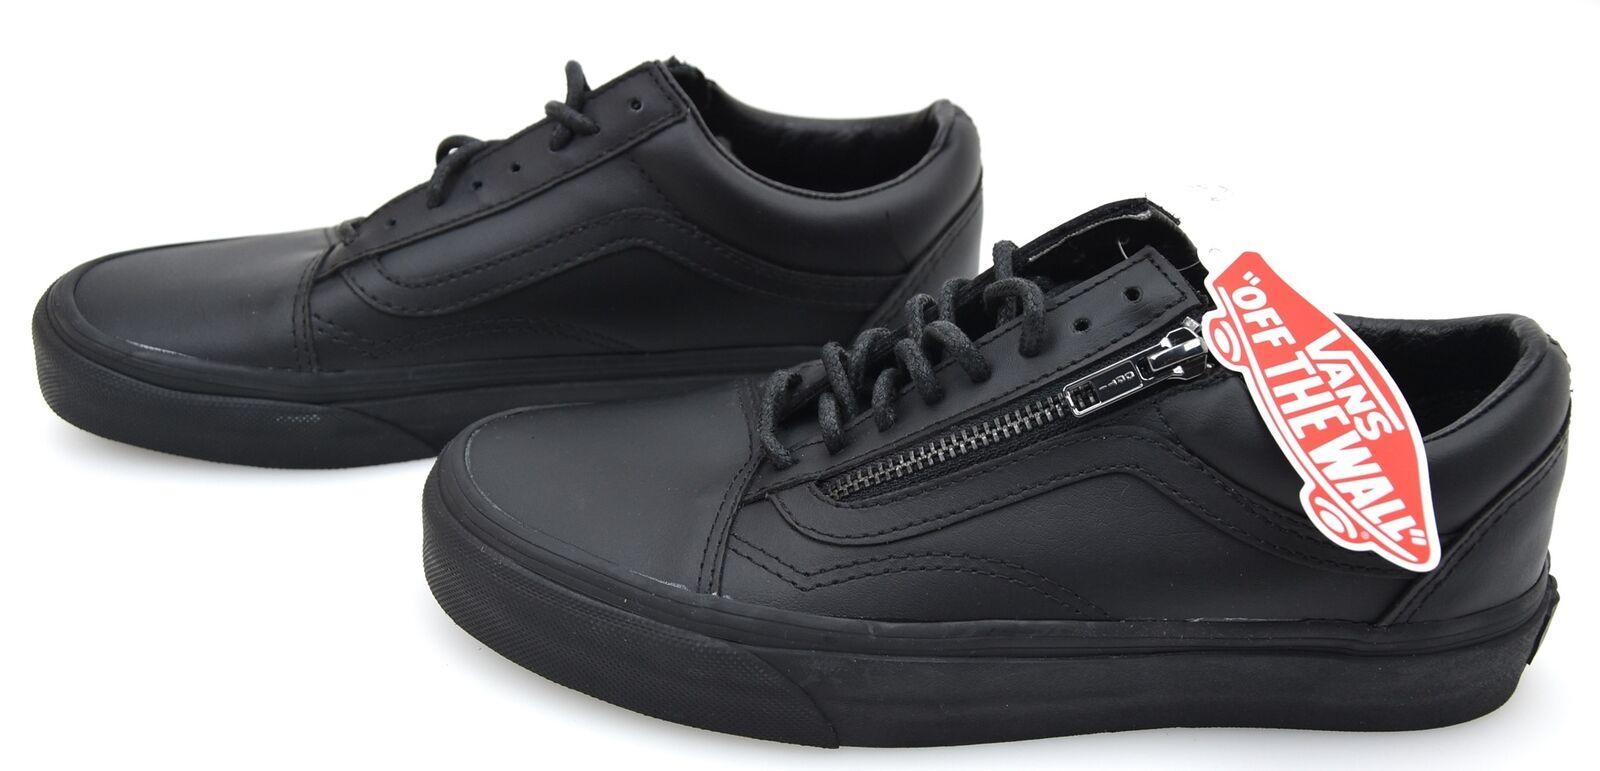 Vans women sneakers casual Casual old skool vn 00018 gjtl gun